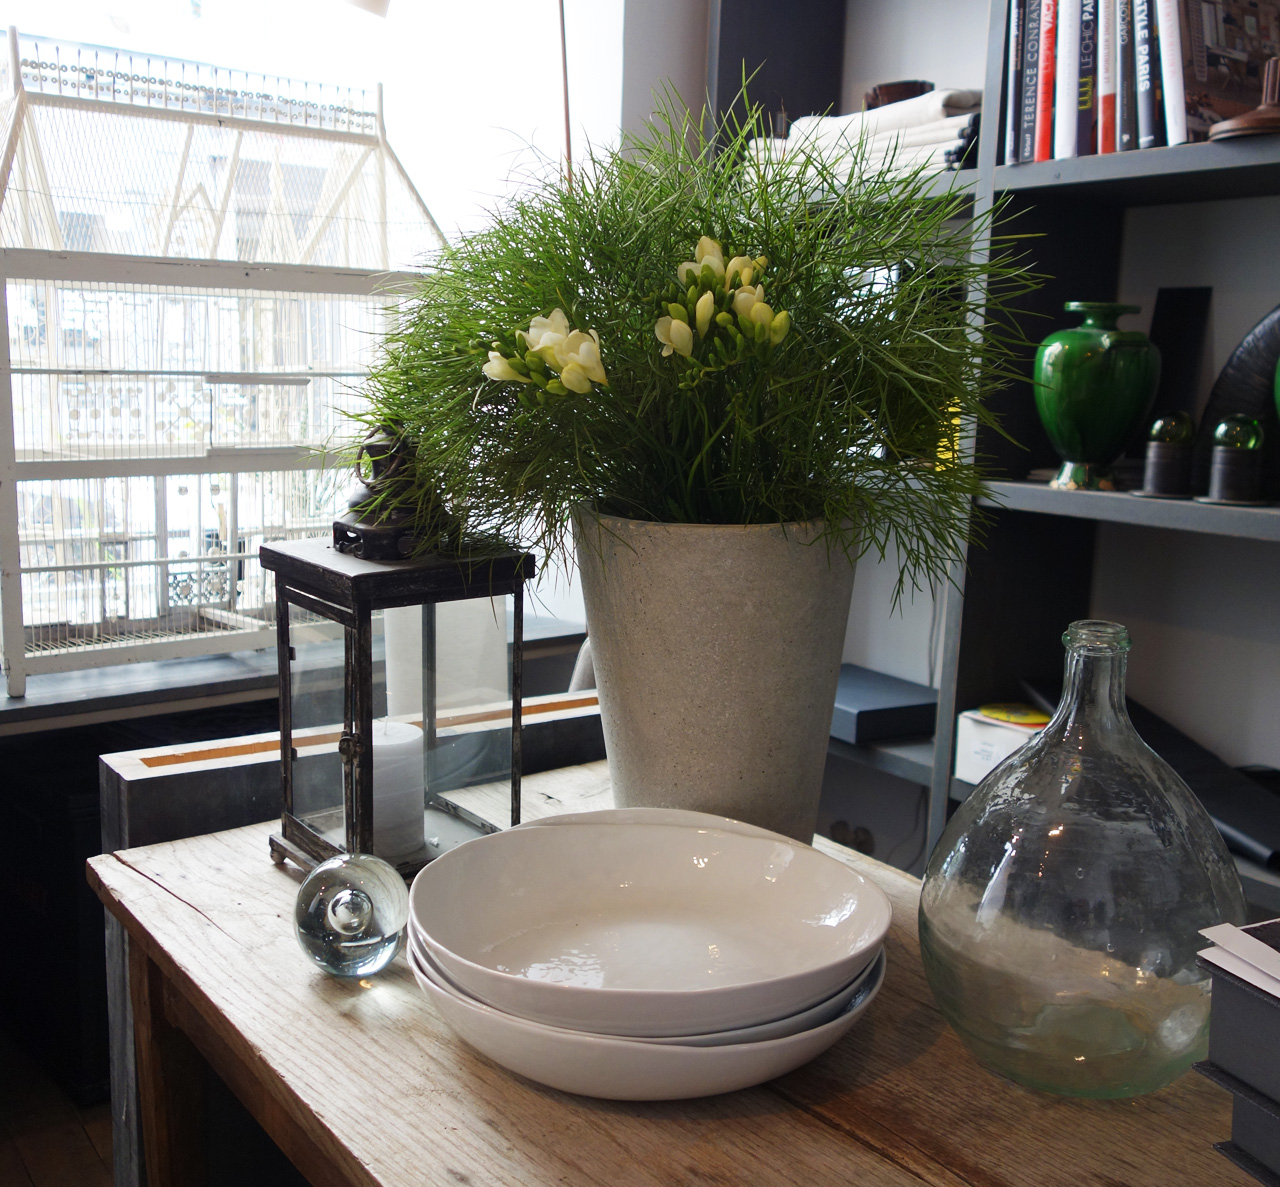 David-Gaillard-Les-Curieuses-deco-vaisselle